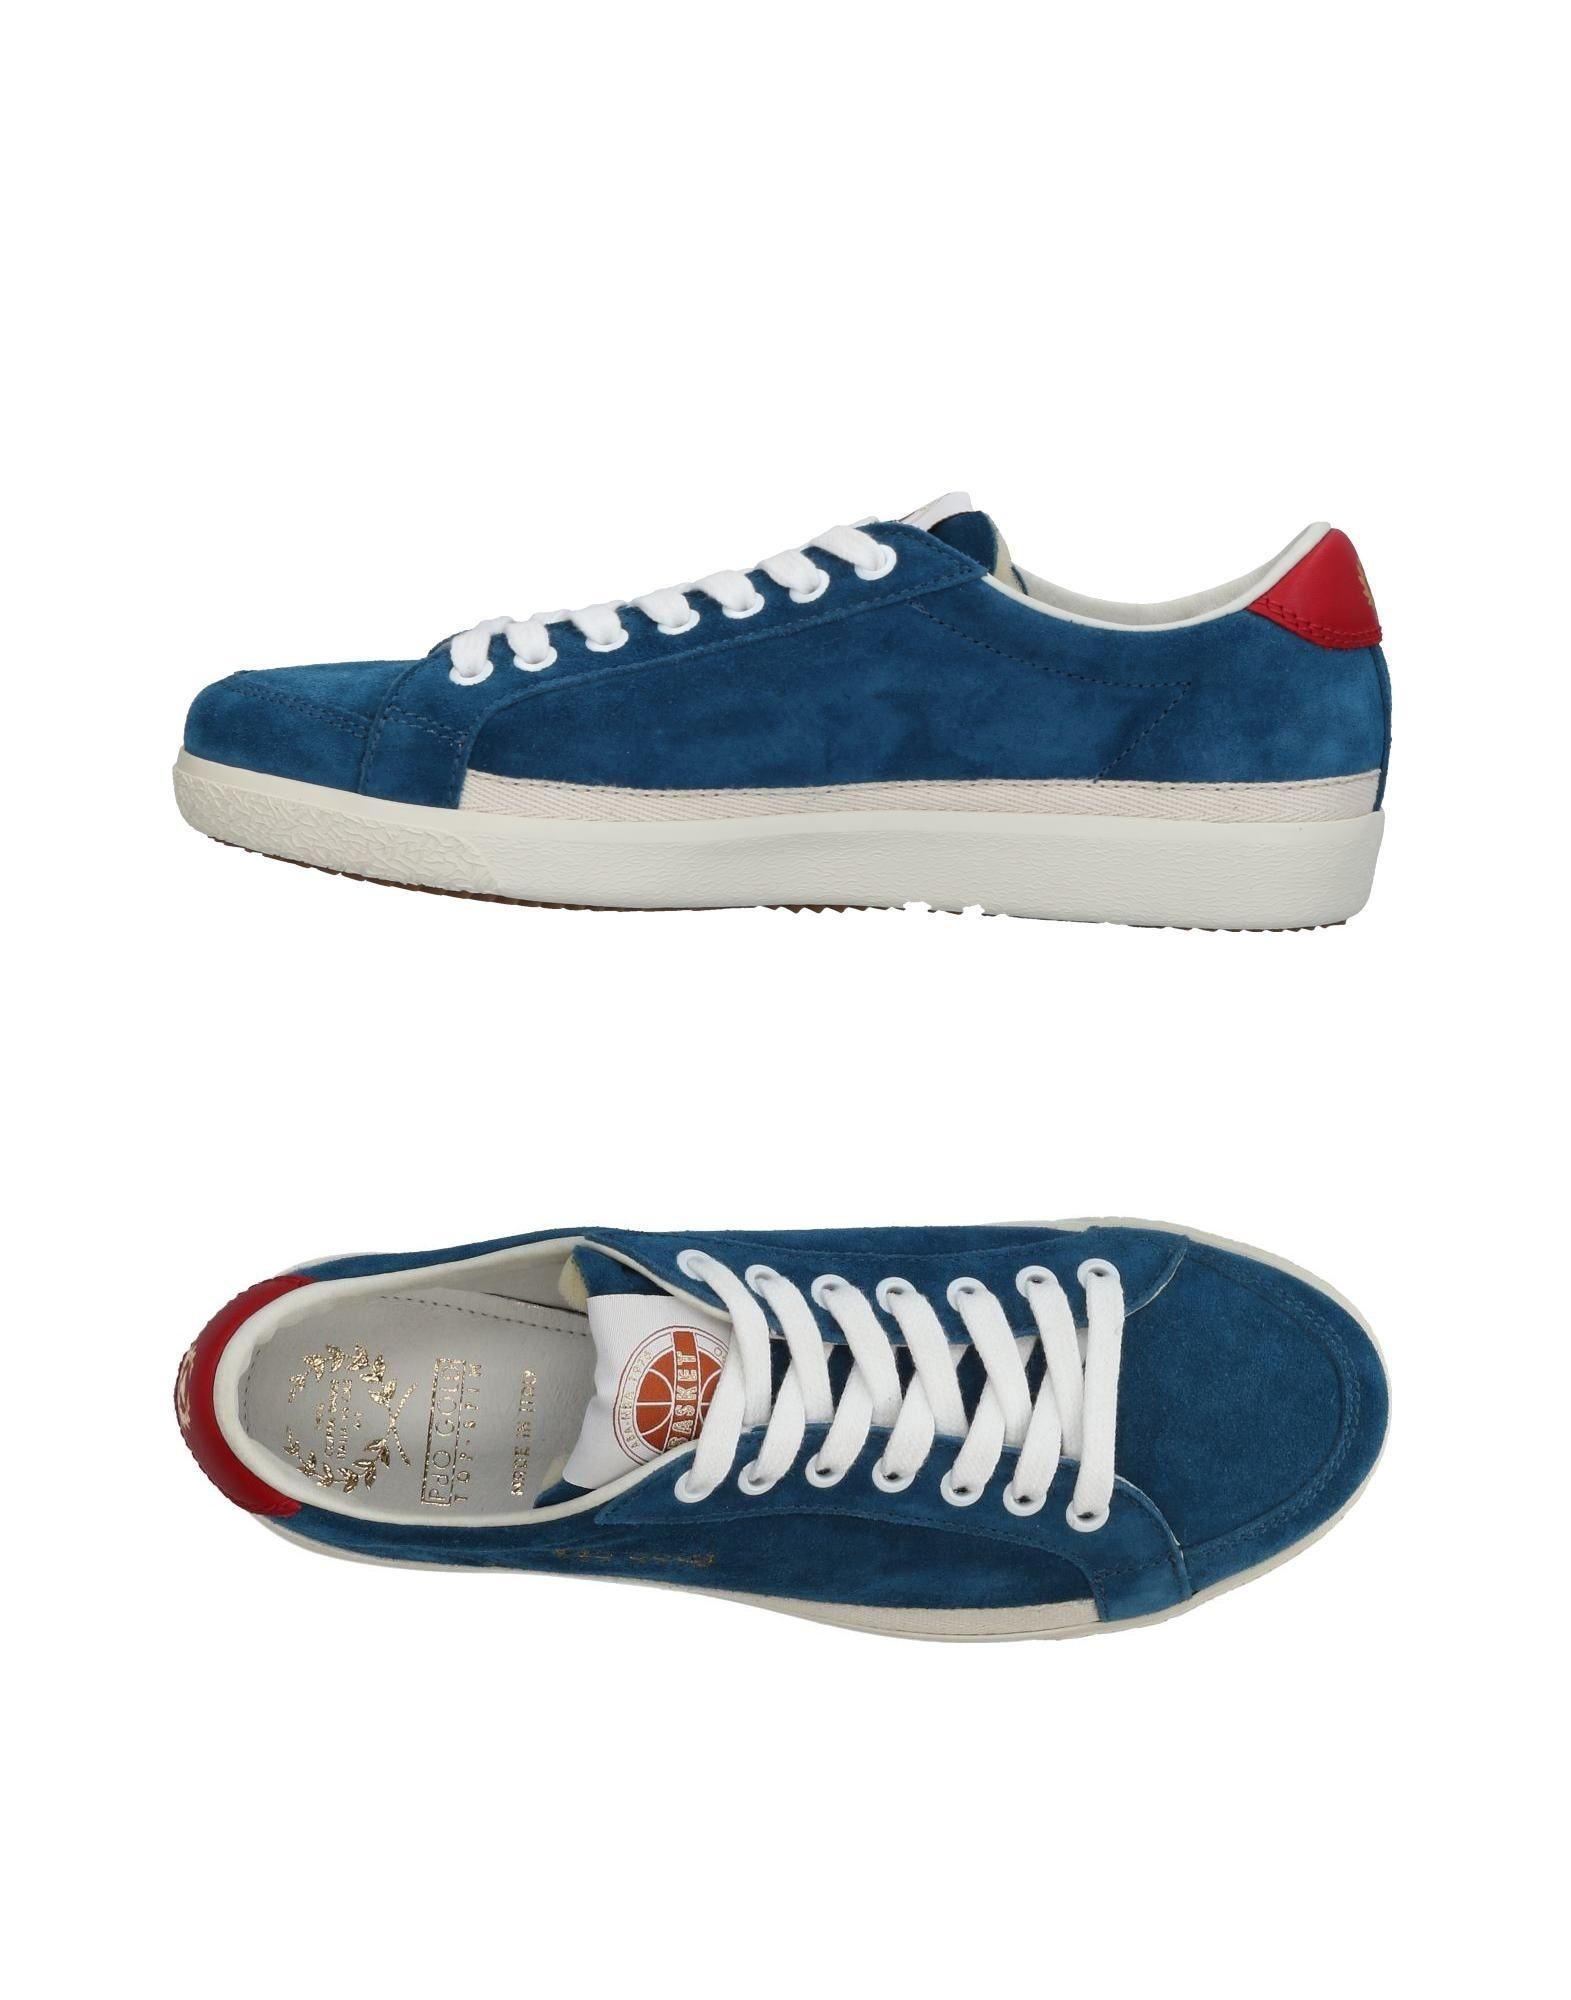 Sneakers Pantofola D'oro Homme - Sneakers Pantofola D'oro  Bleu Confortable et belle